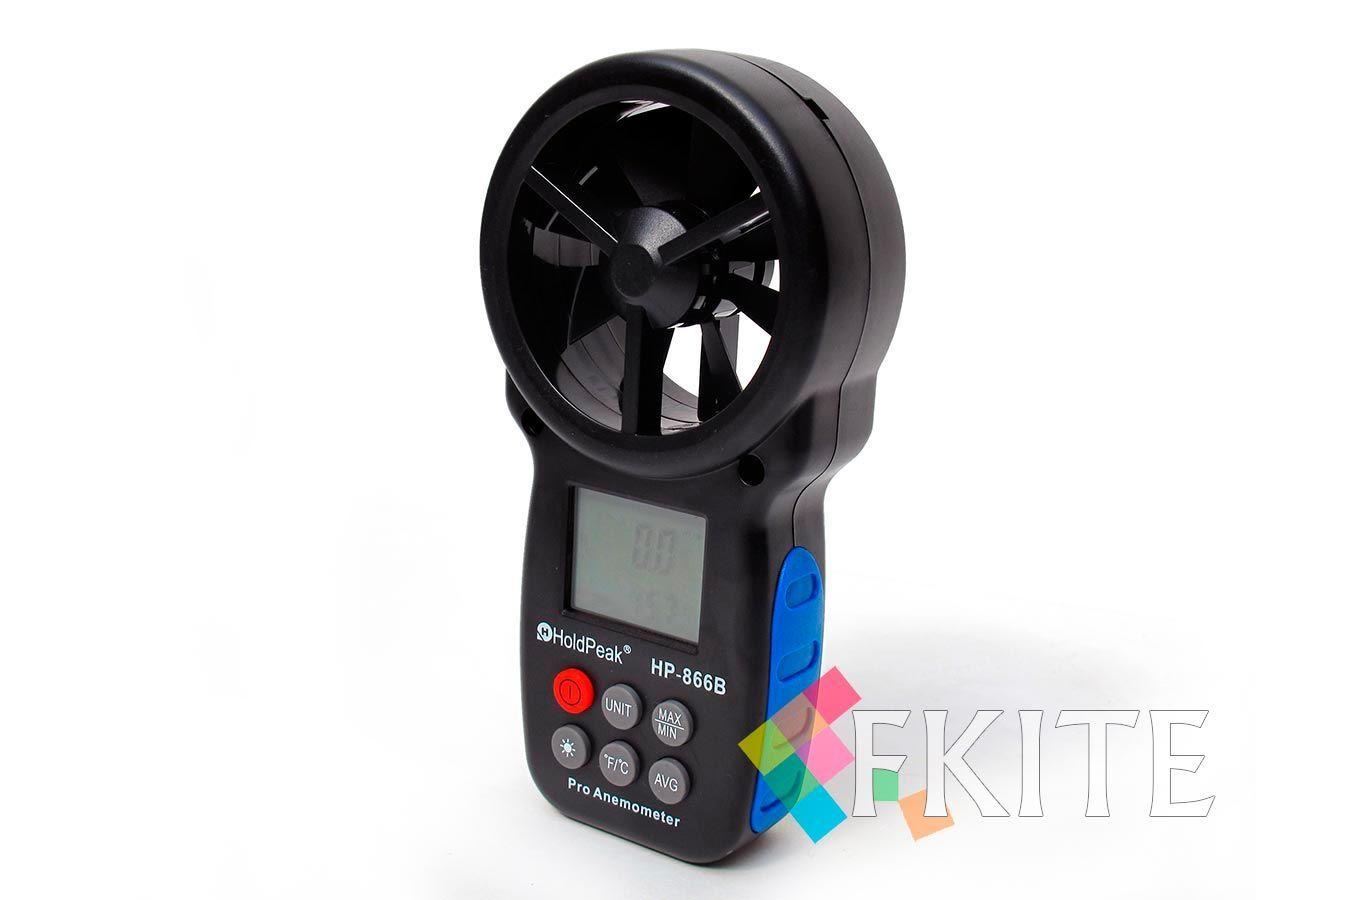 Анемометр цифровой крыльчатый HoldPeak PRO HP-866B [DA010]